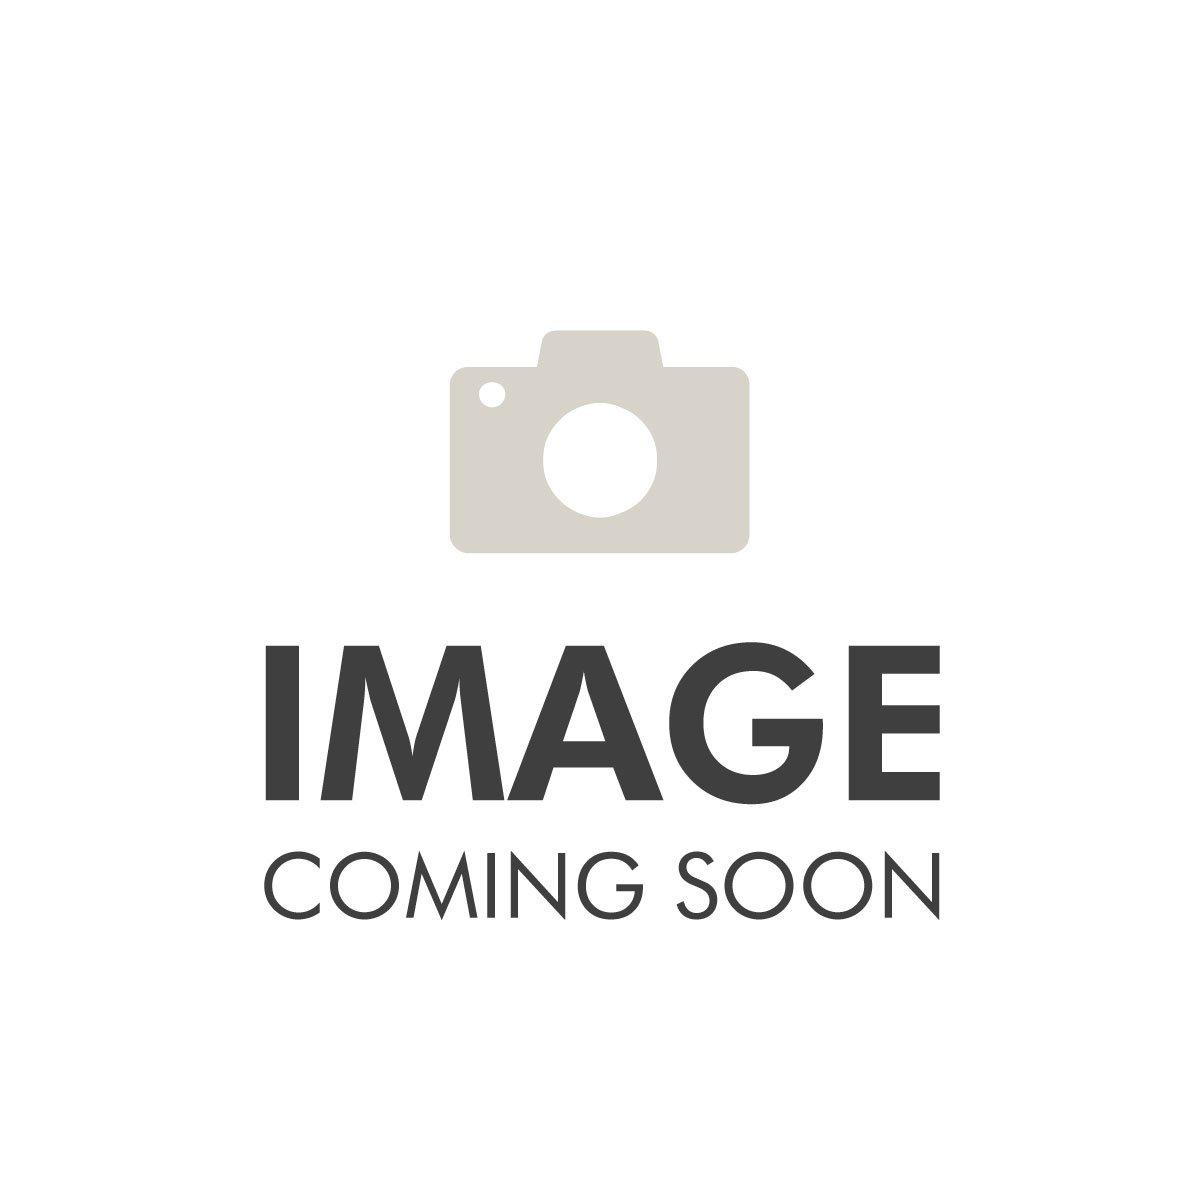 Clarins Men 20ml Anti-Fatigue Eye Serum